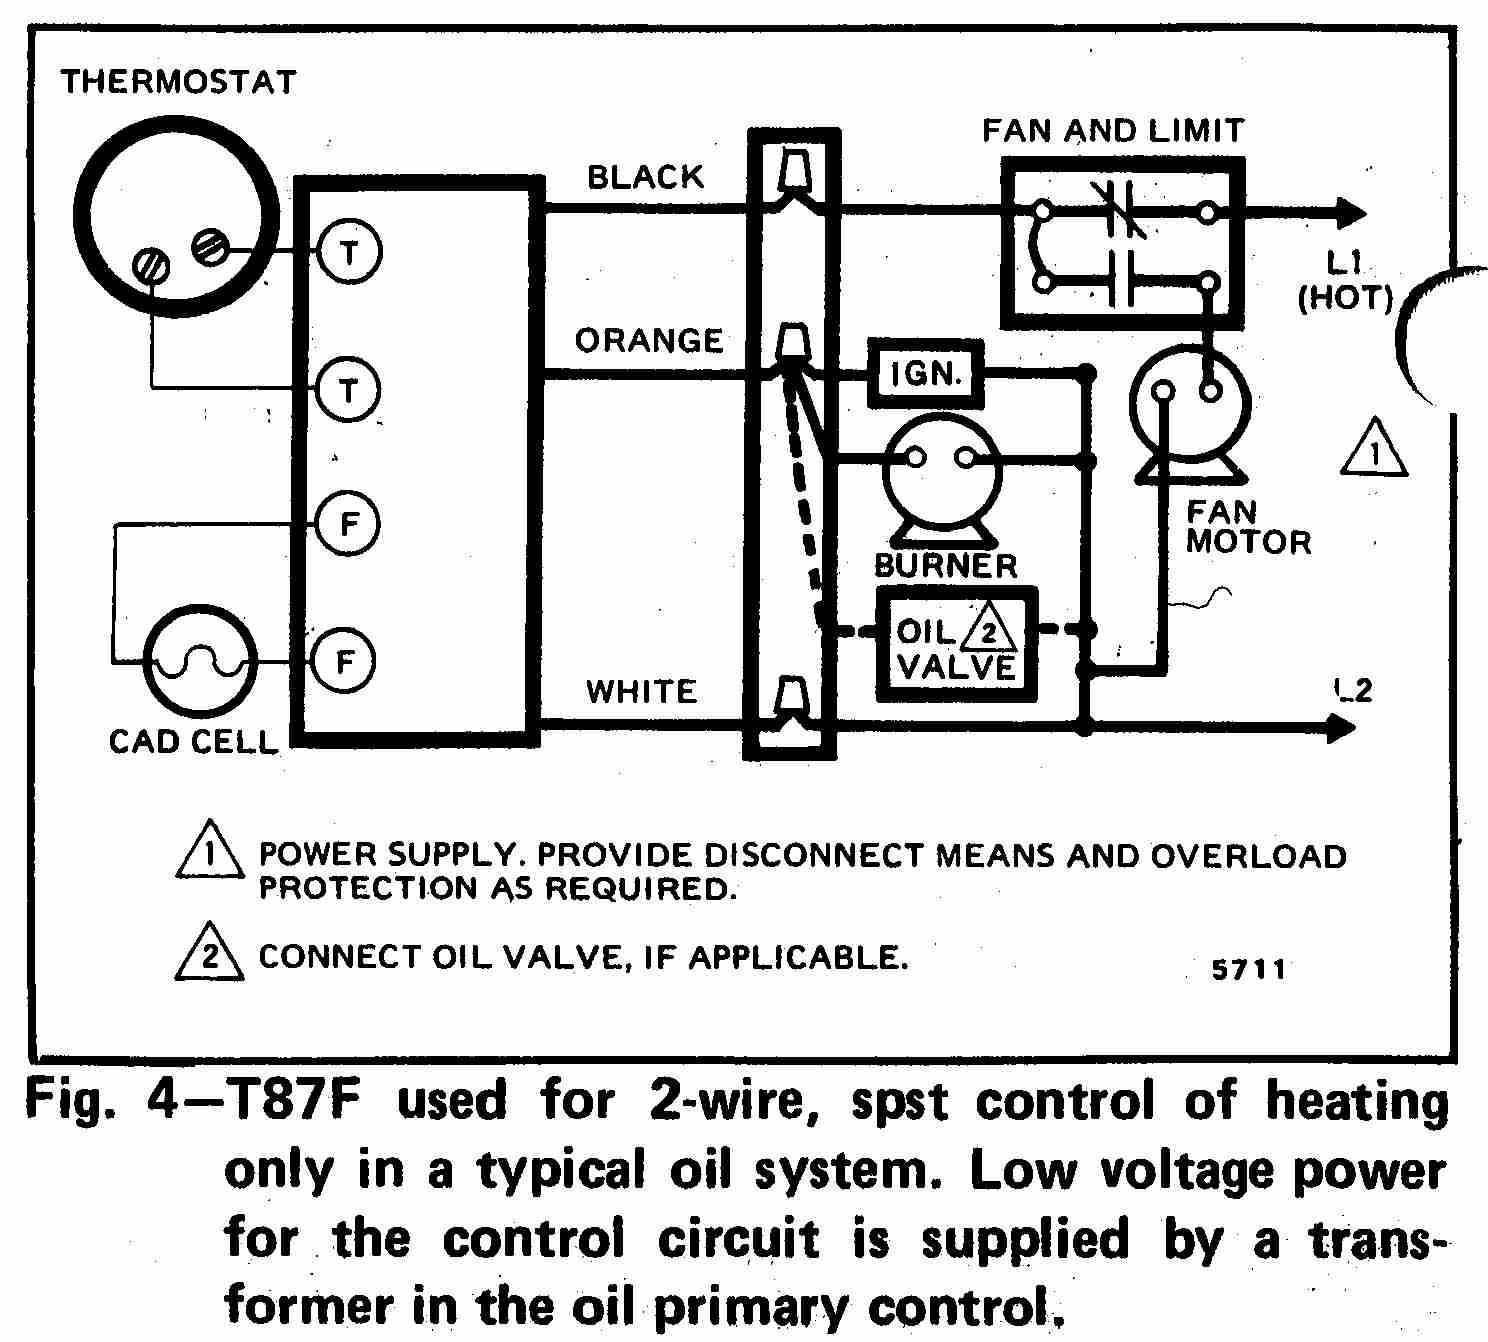 Modine Heater Thermostat Wiring Diagram